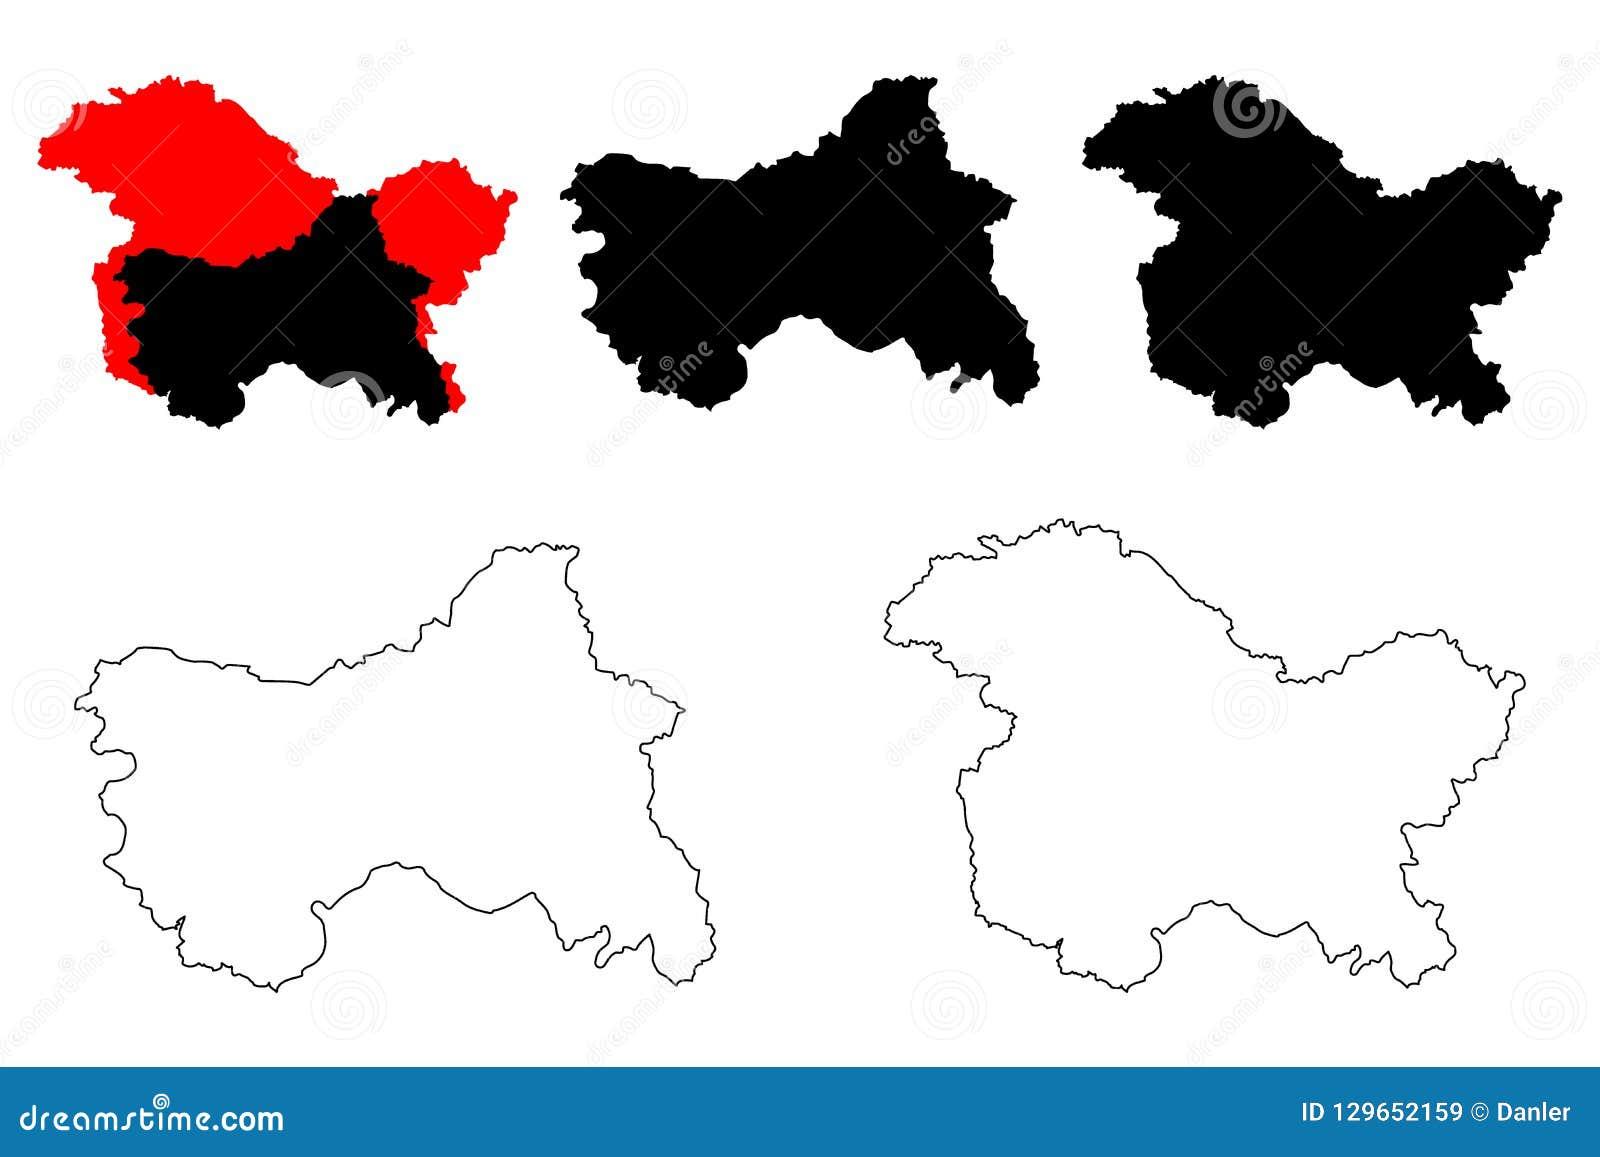 Jammu And Kashmir Map Vector Stock Vector - Illustration of